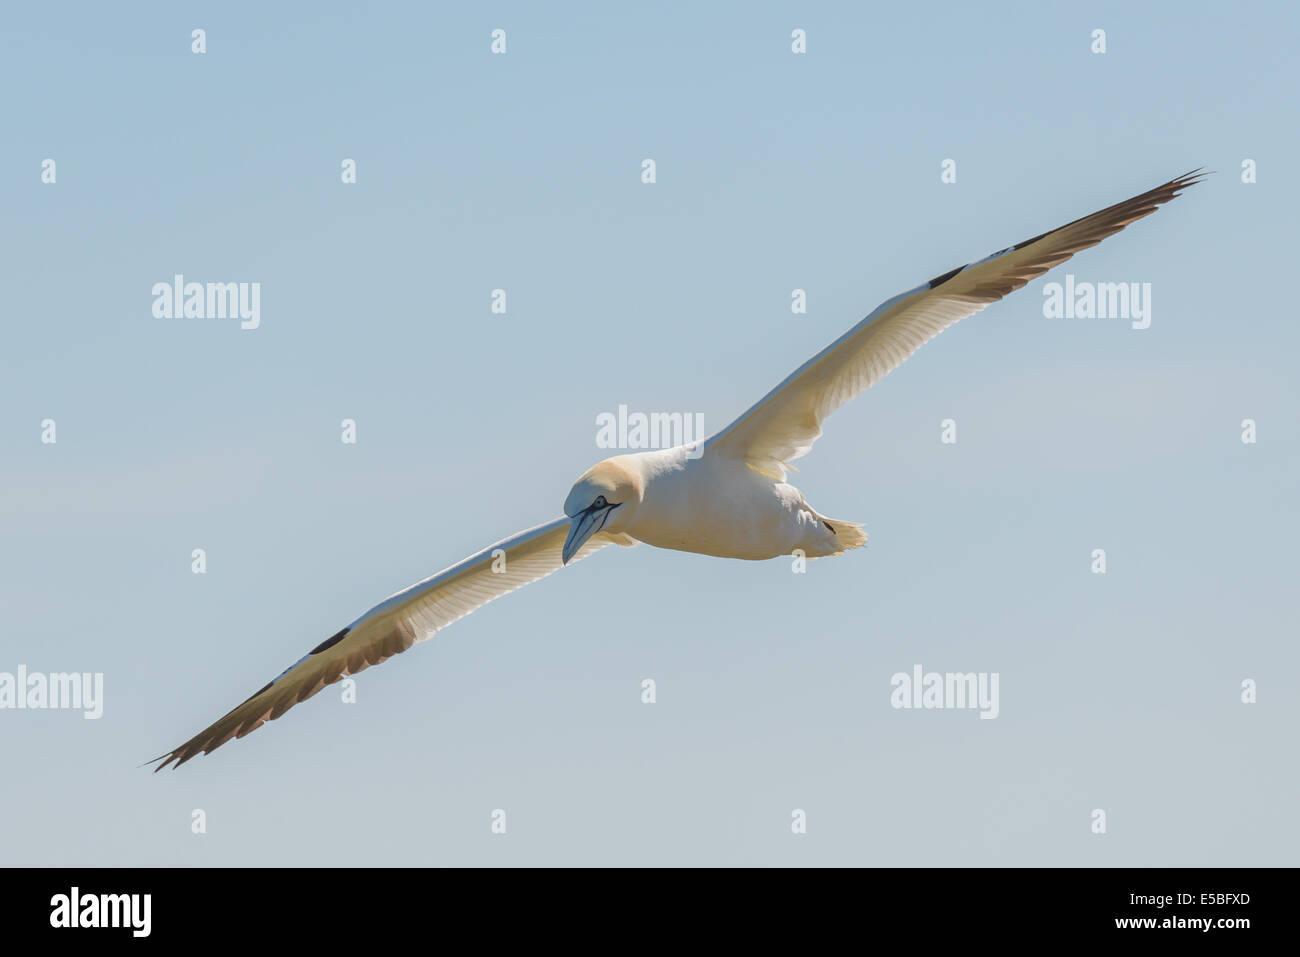 A northern gannet (Morus bassanus; Sula bassana) glides in flight flying airborne against a hazy blue sky UK. - Stock Image